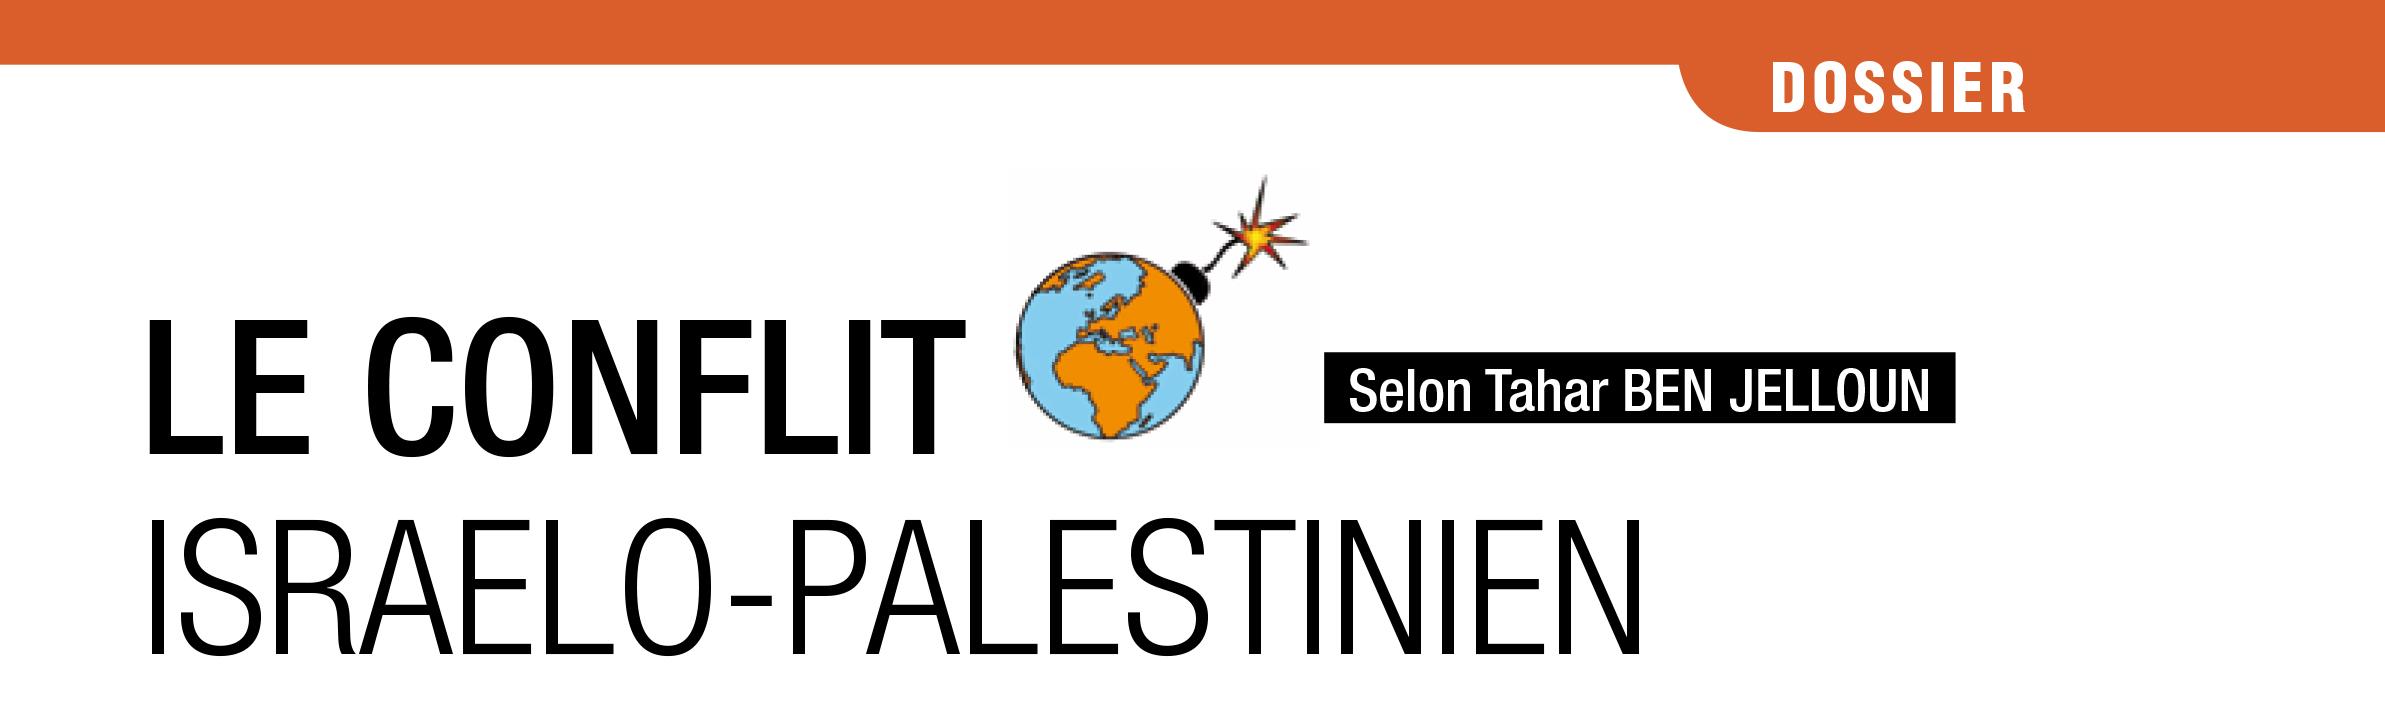 Le conflit israélo-palestinien – selon Tahar Ben JELLOUN